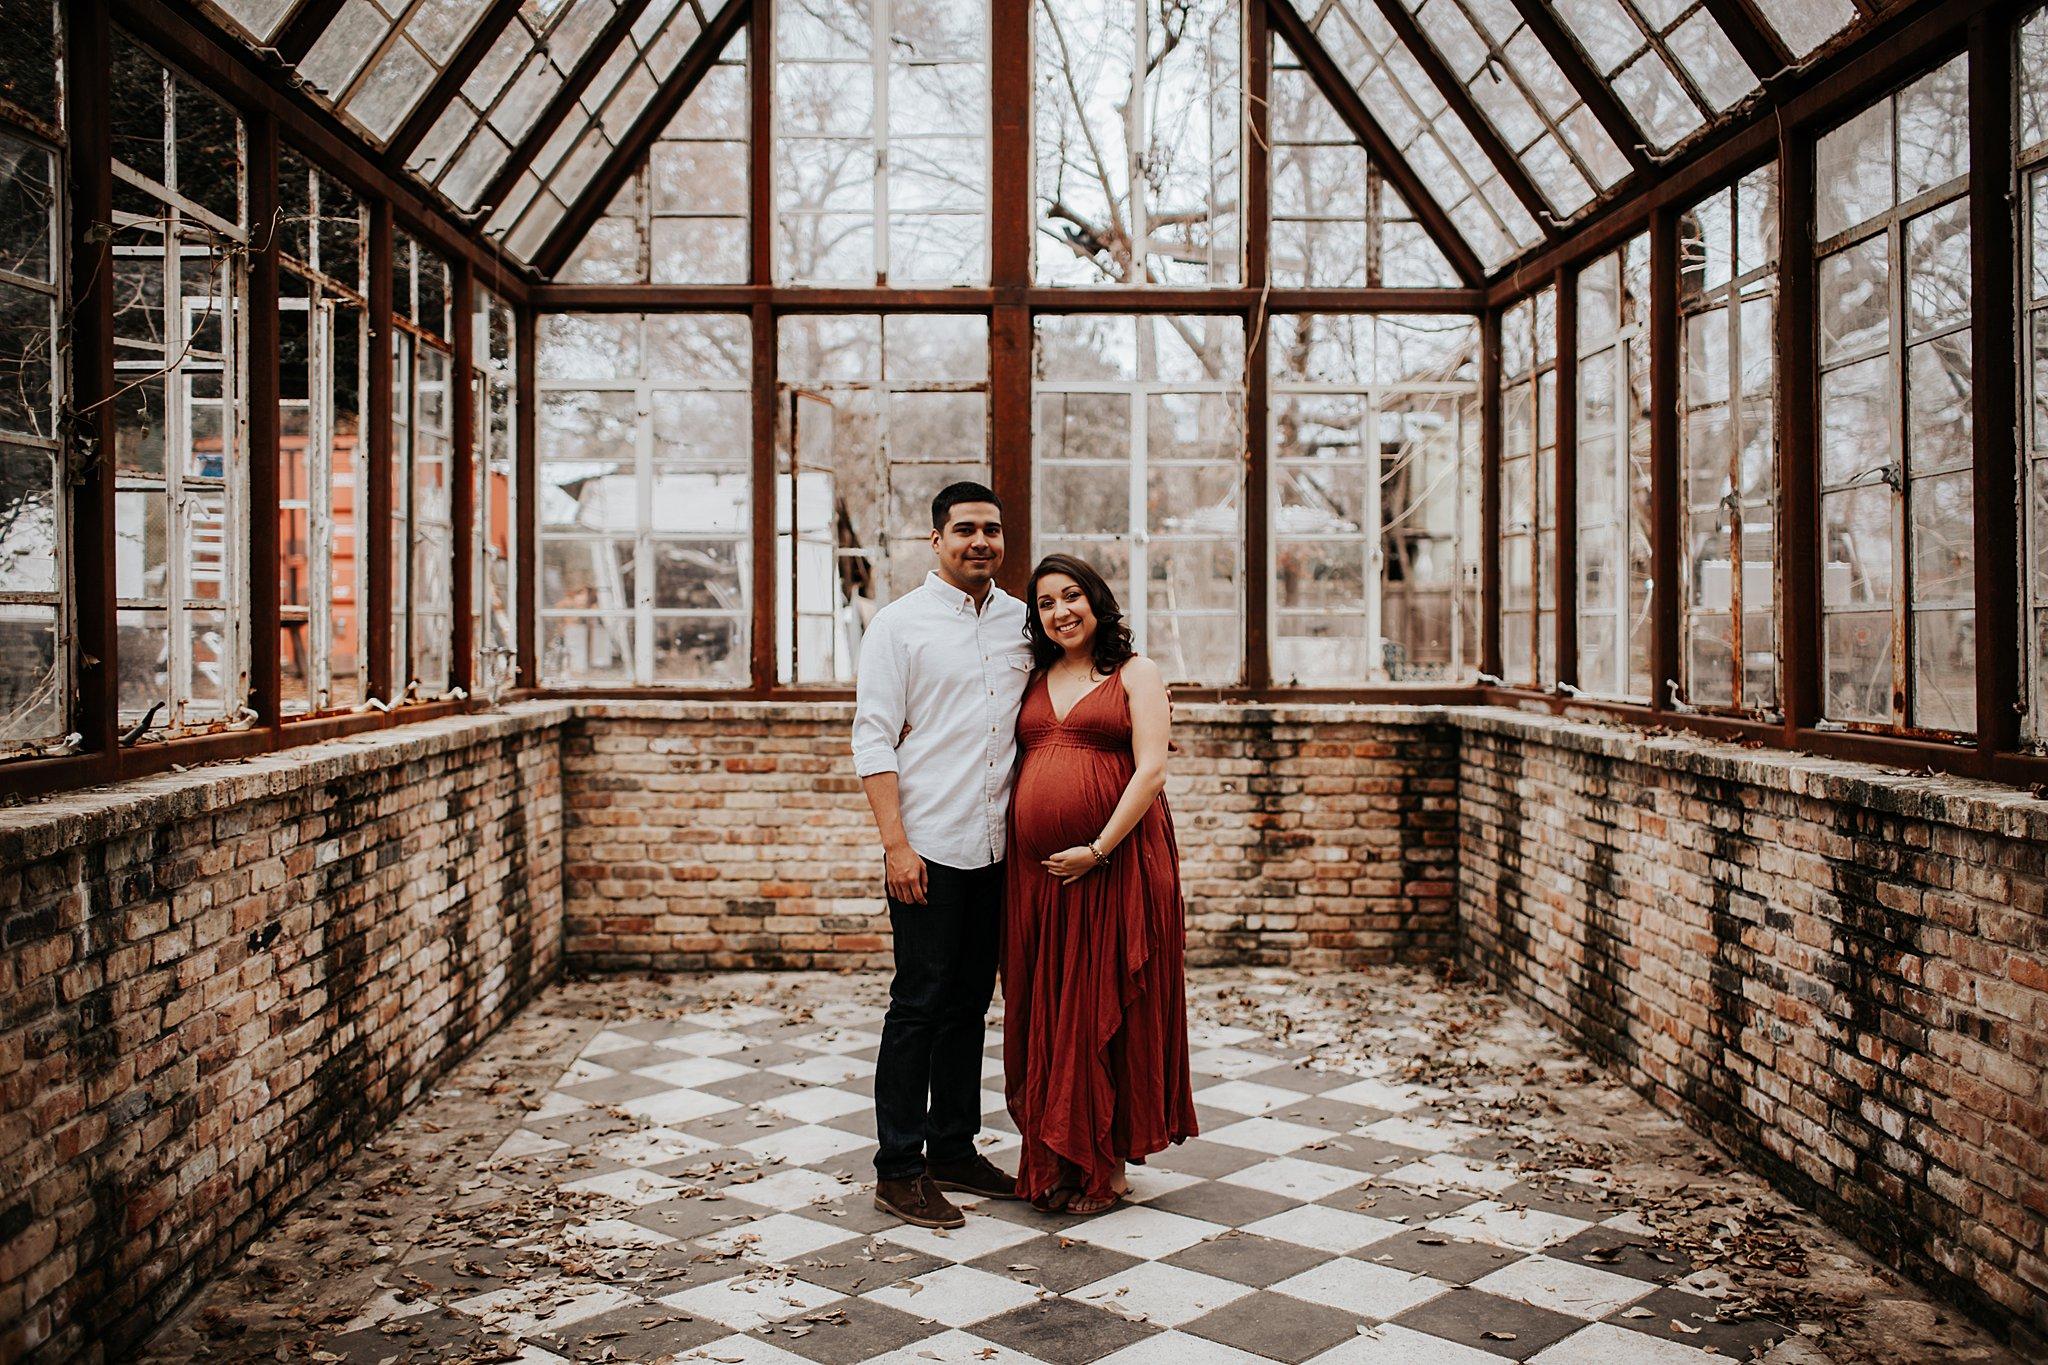 Julia-San-Antonio-Maternity-Photographer-4_WEB.jpg